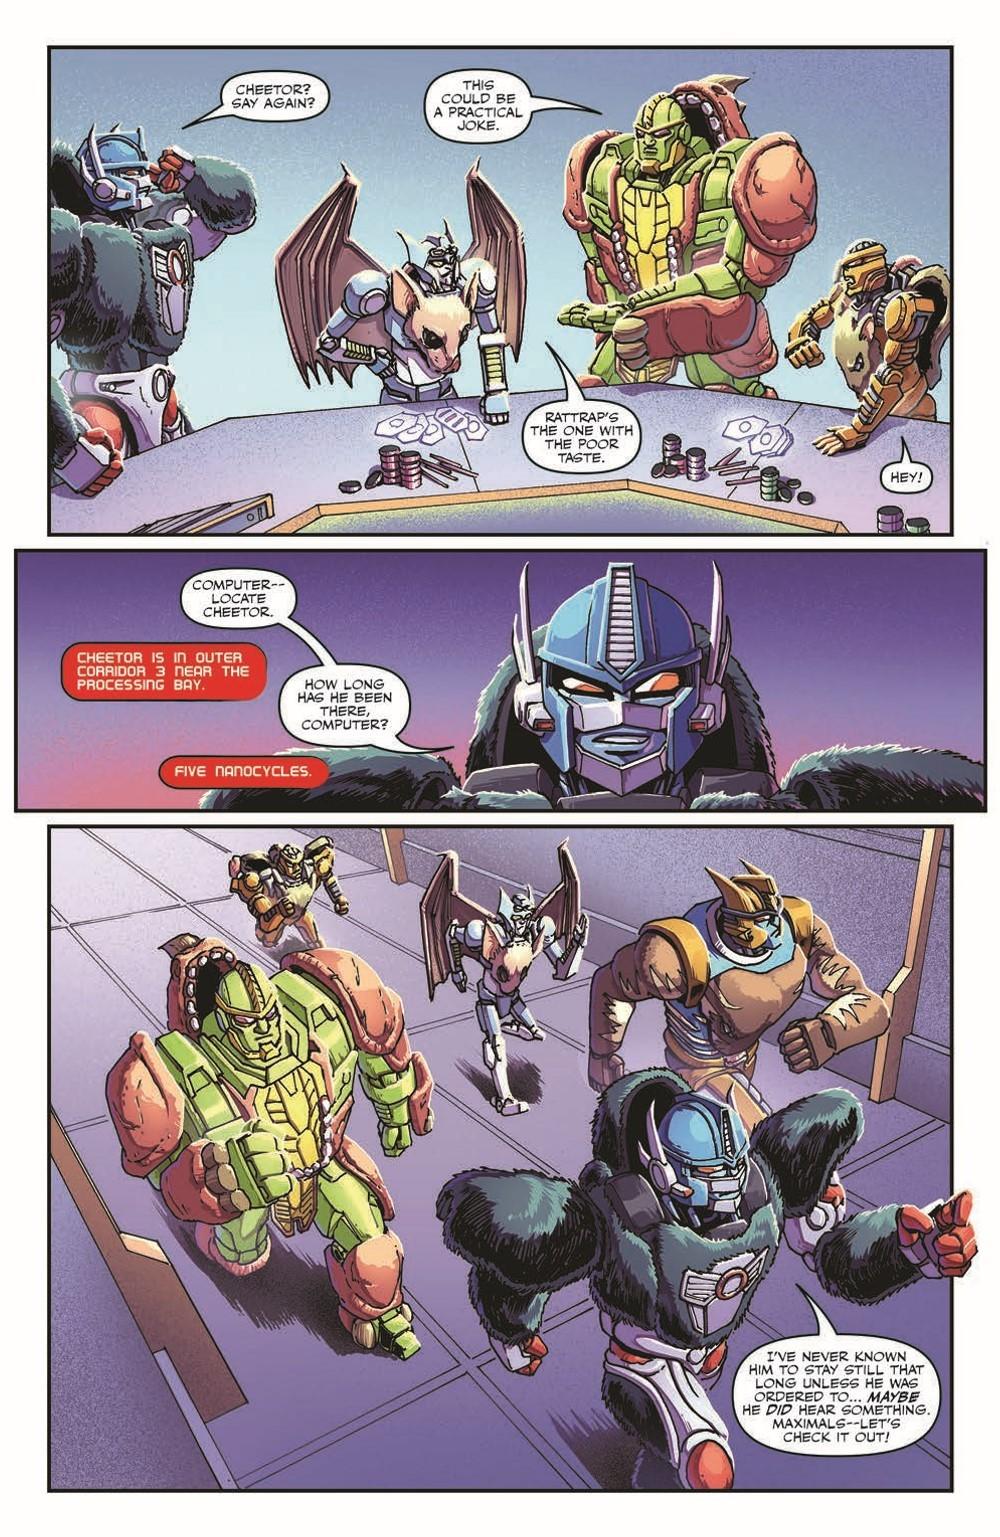 TFBW_08_pr-3 ComicList Previews: TRANSFORMERS BEAST WARS #8